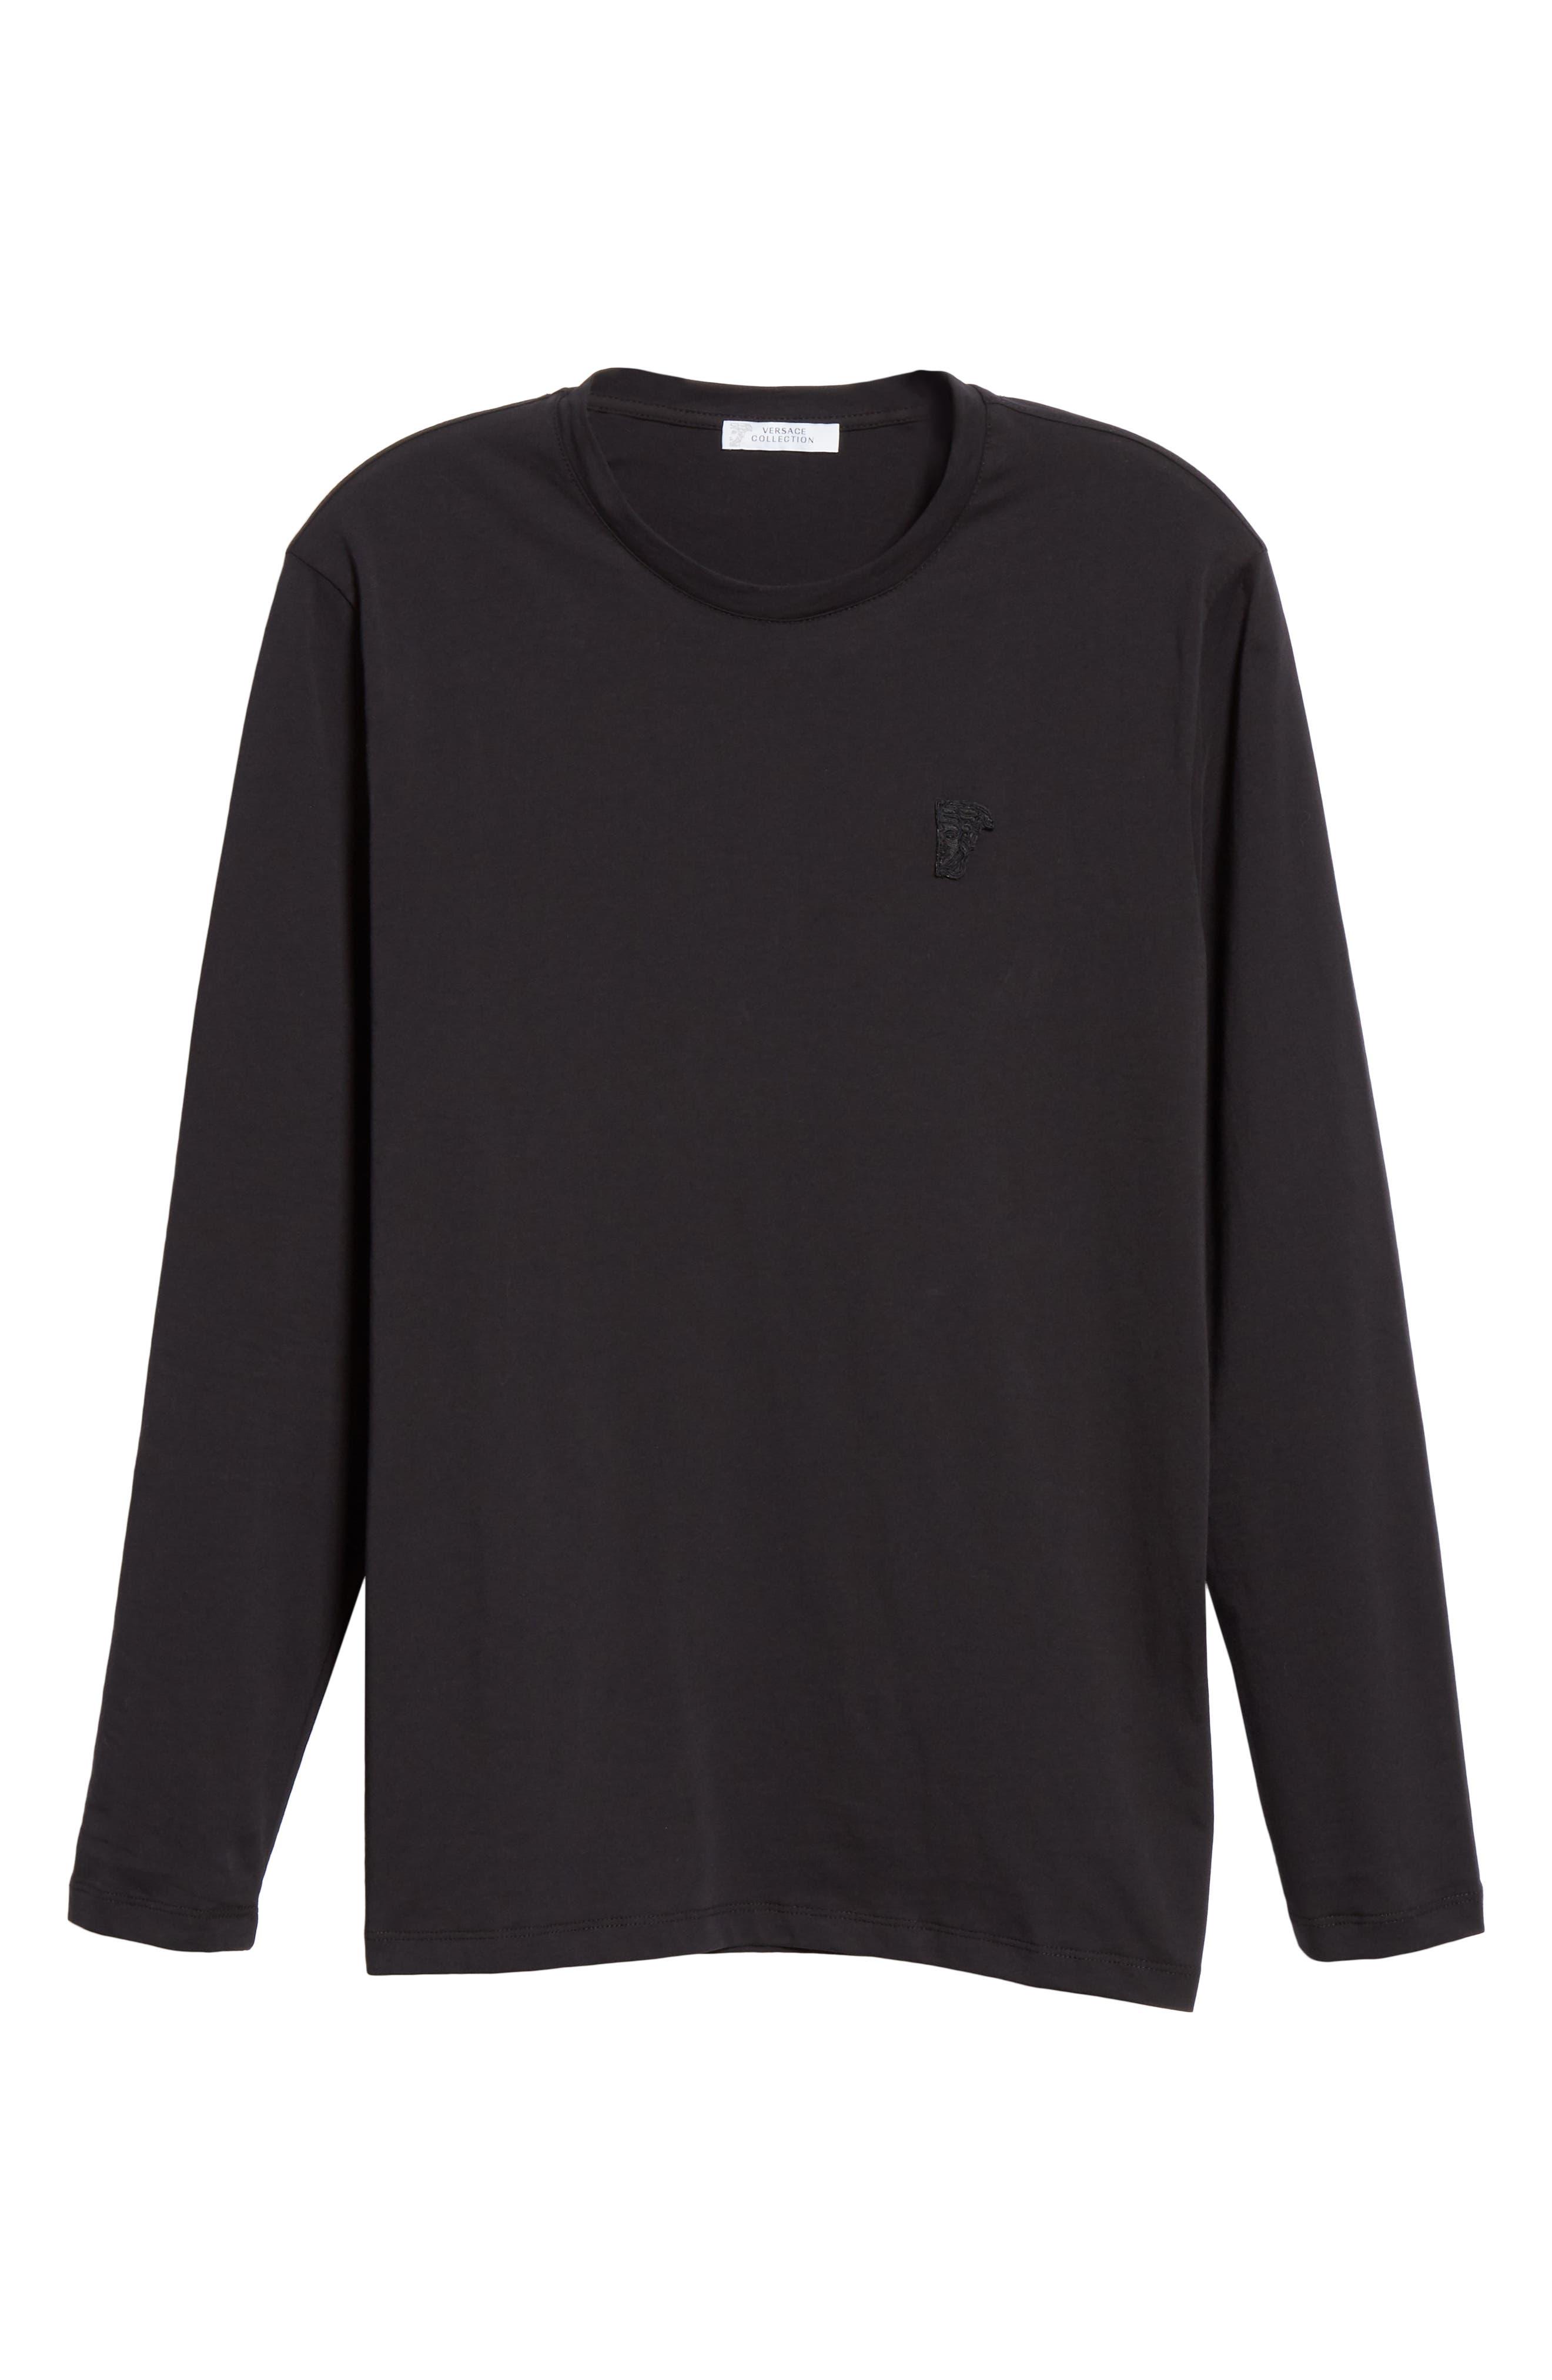 VERSACE COLLECTION,                             Medusa Long Sleeve T-Shirt,                             Alternate thumbnail 6, color,                             BLACK